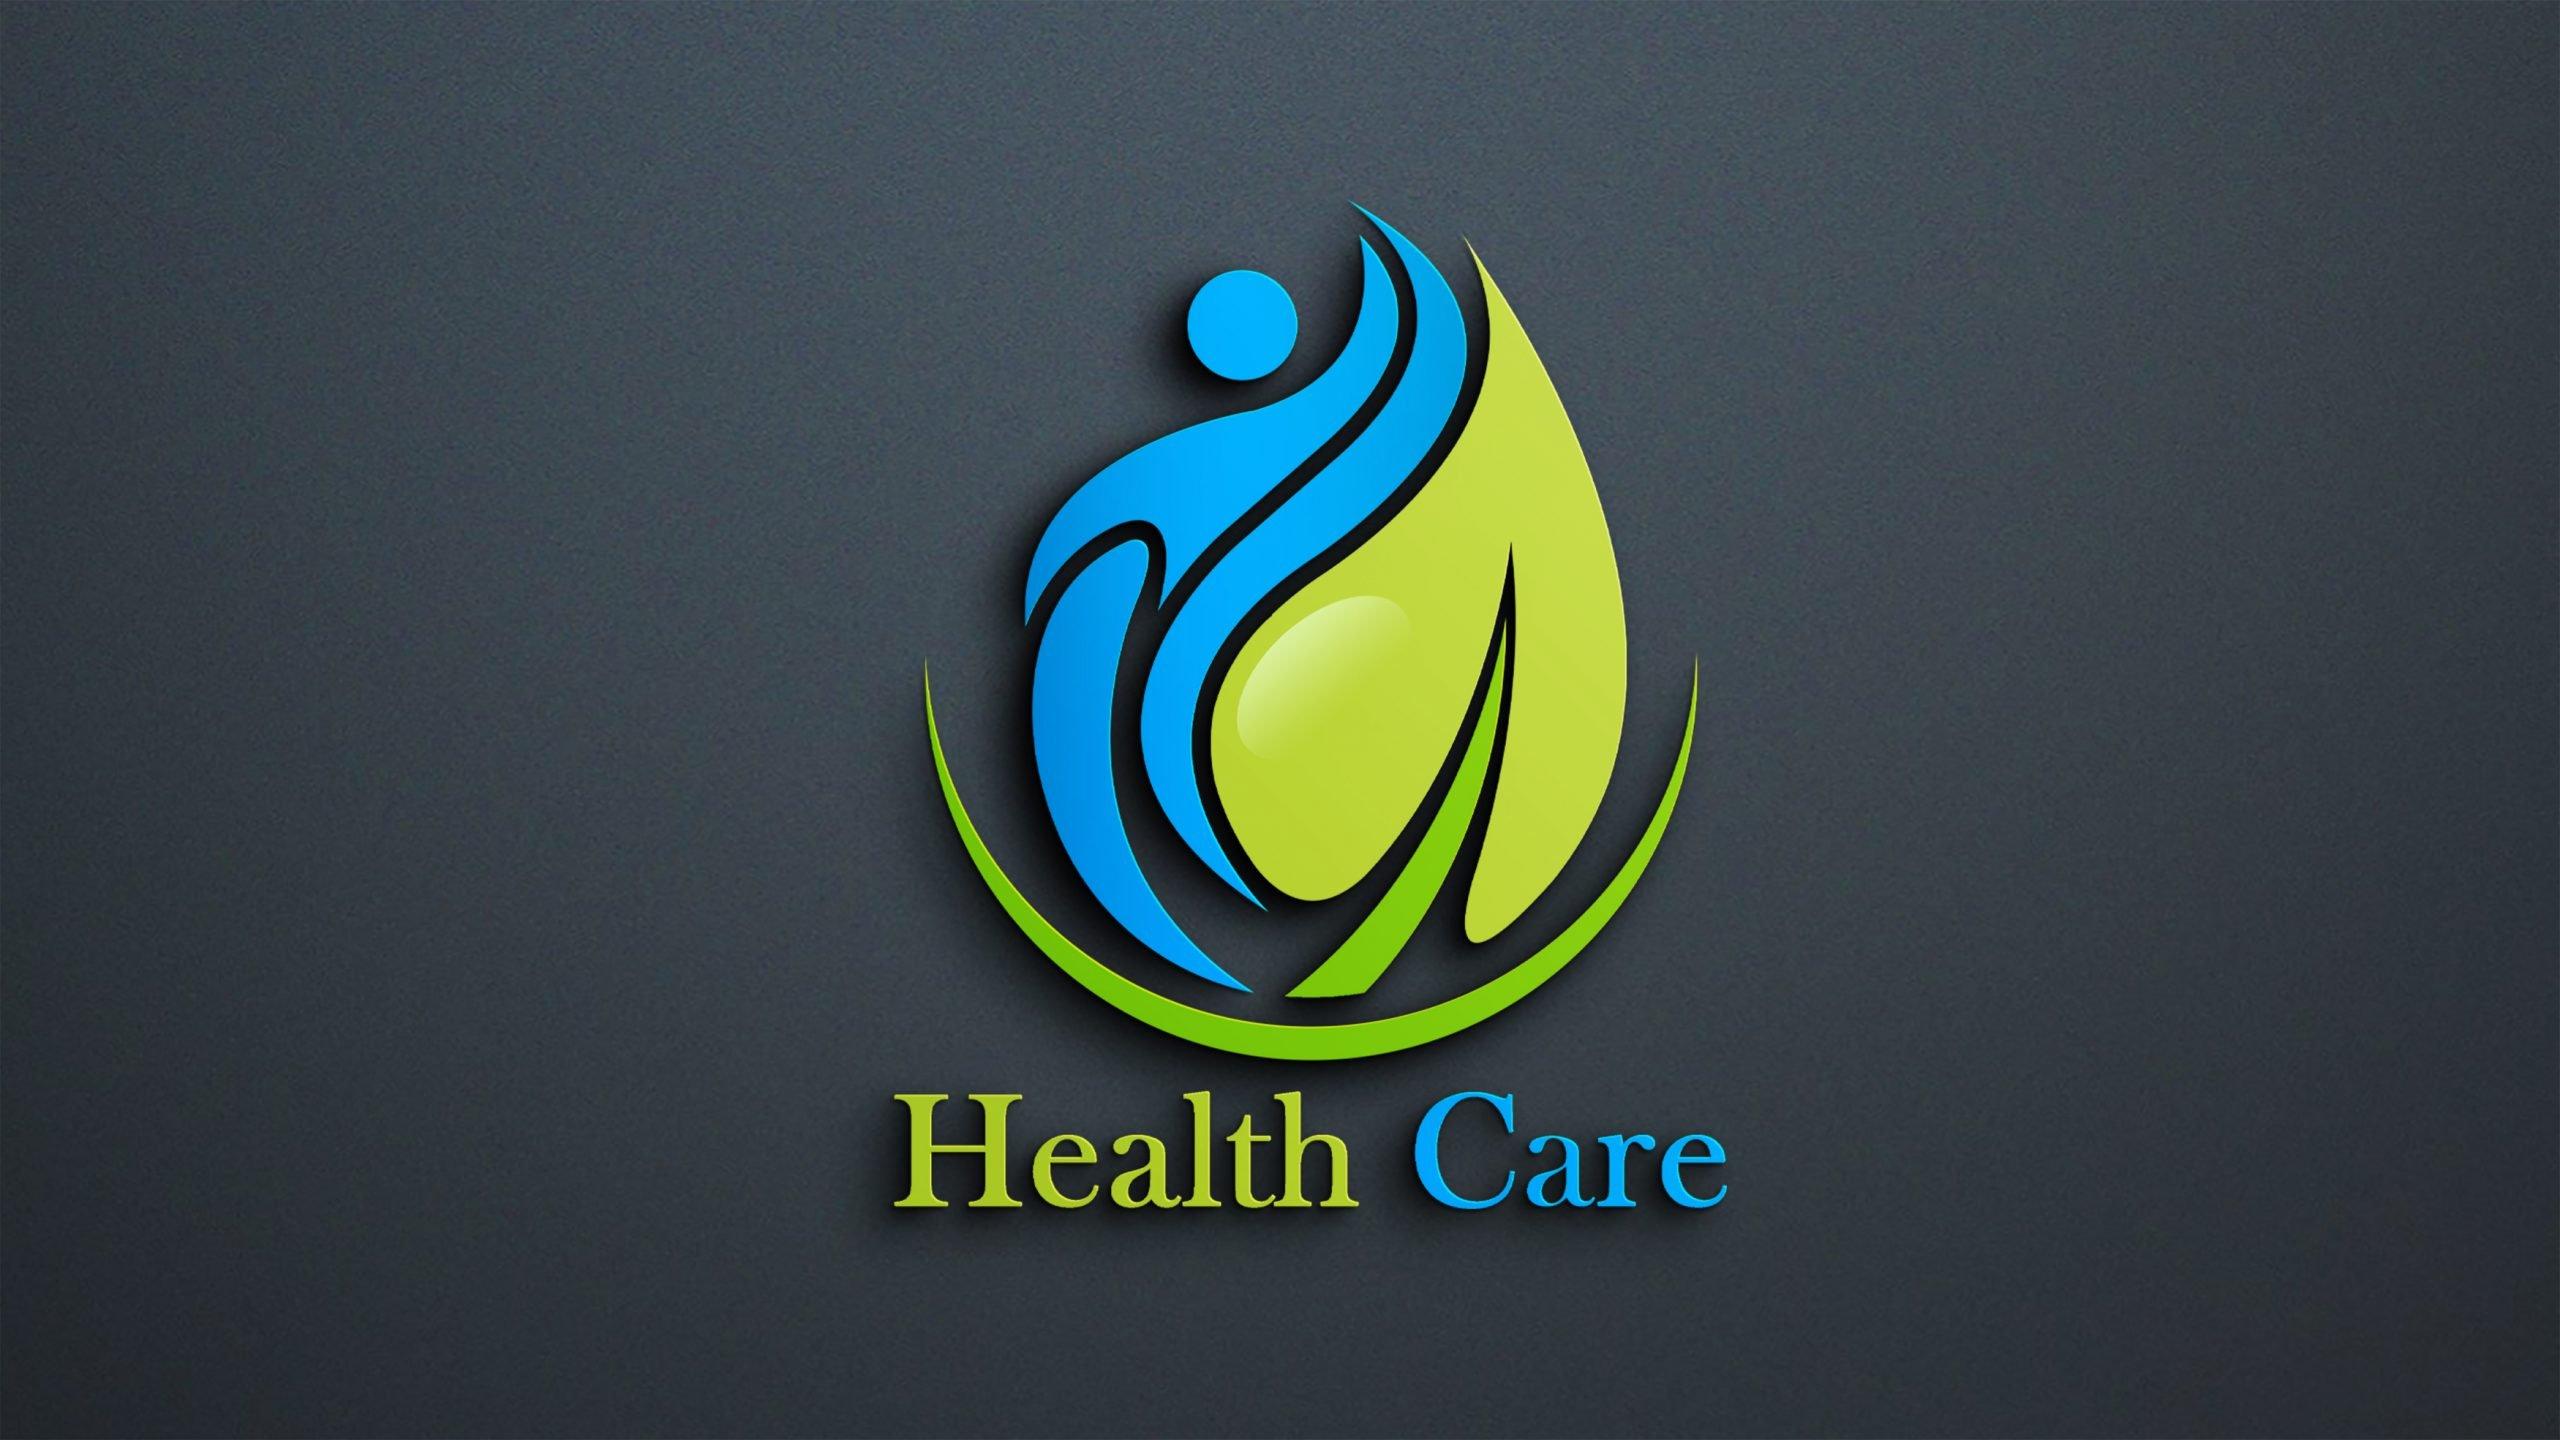 Free Download Editable Health Logo Design Template